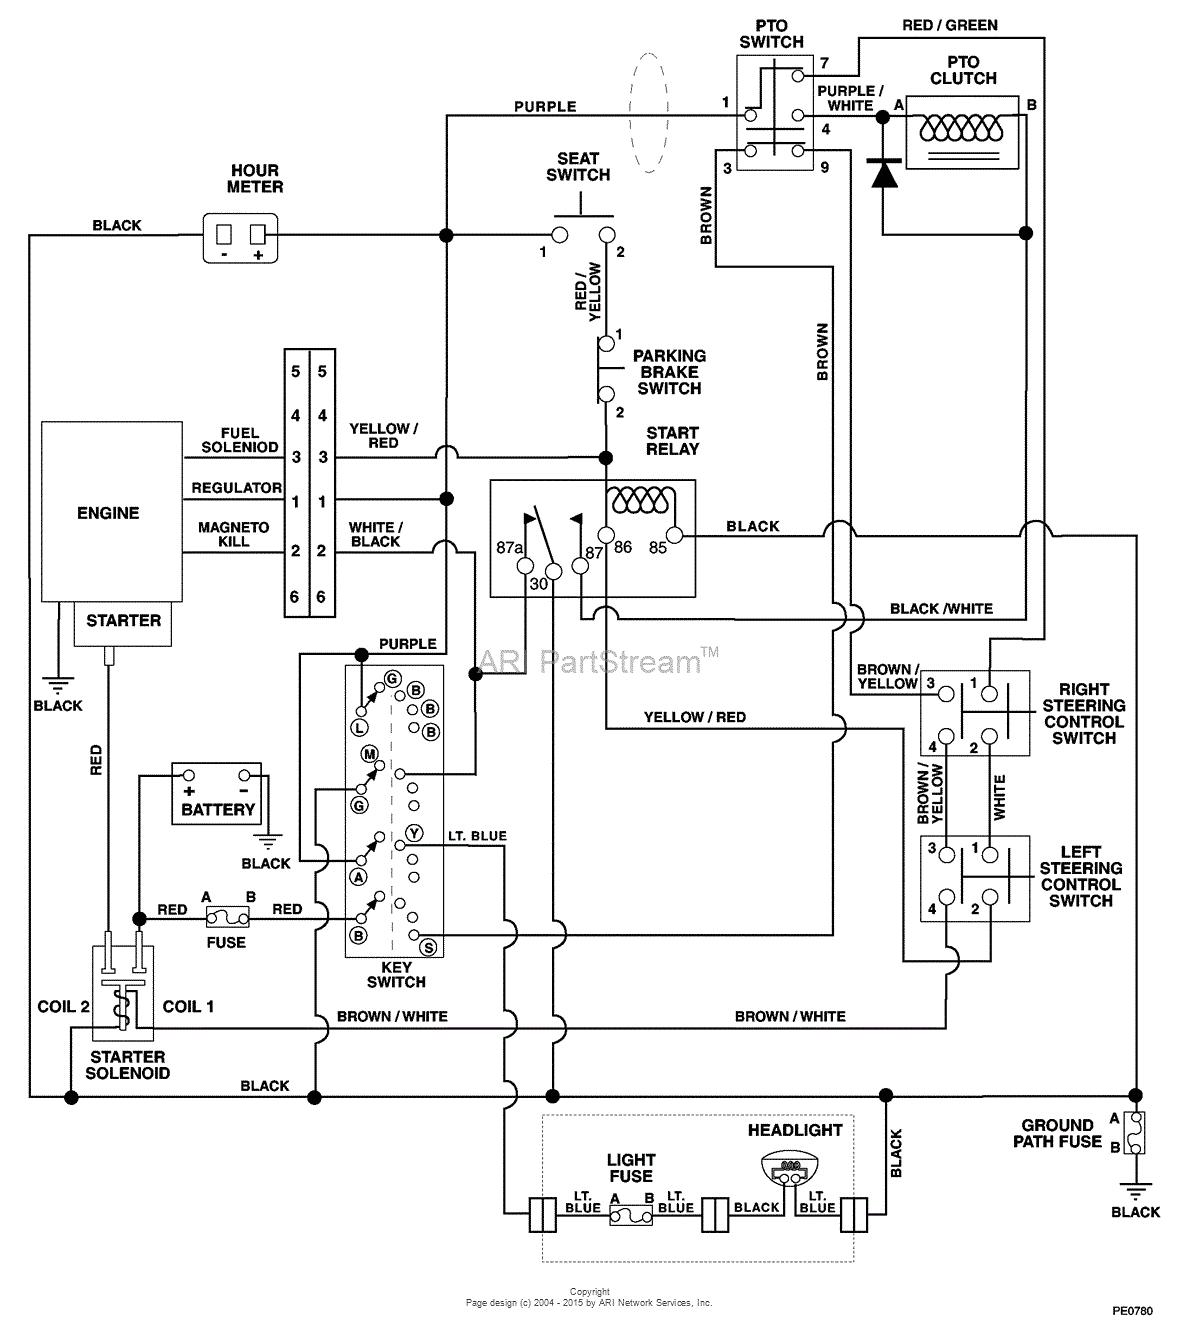 damon rv battery wiring diagram free download wiring diagram 1 2003 country coach wiring diagrams wiring